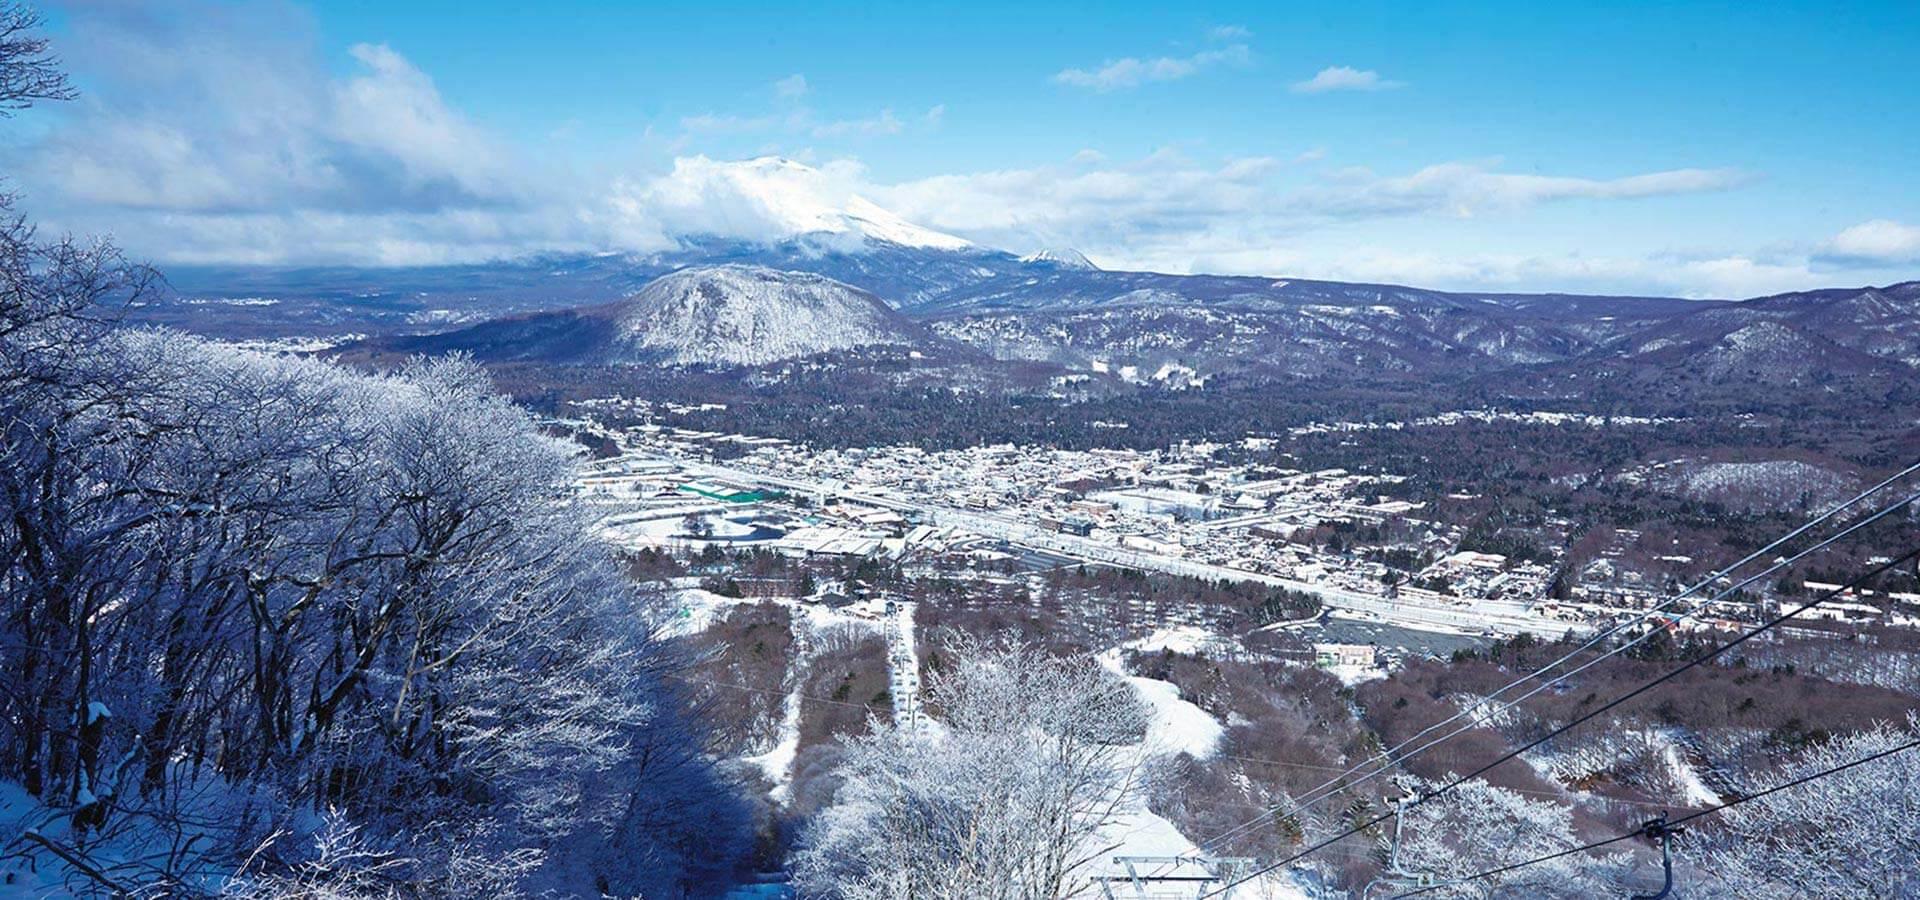 Karuizawa Ski Area opened for 2016-17 season!